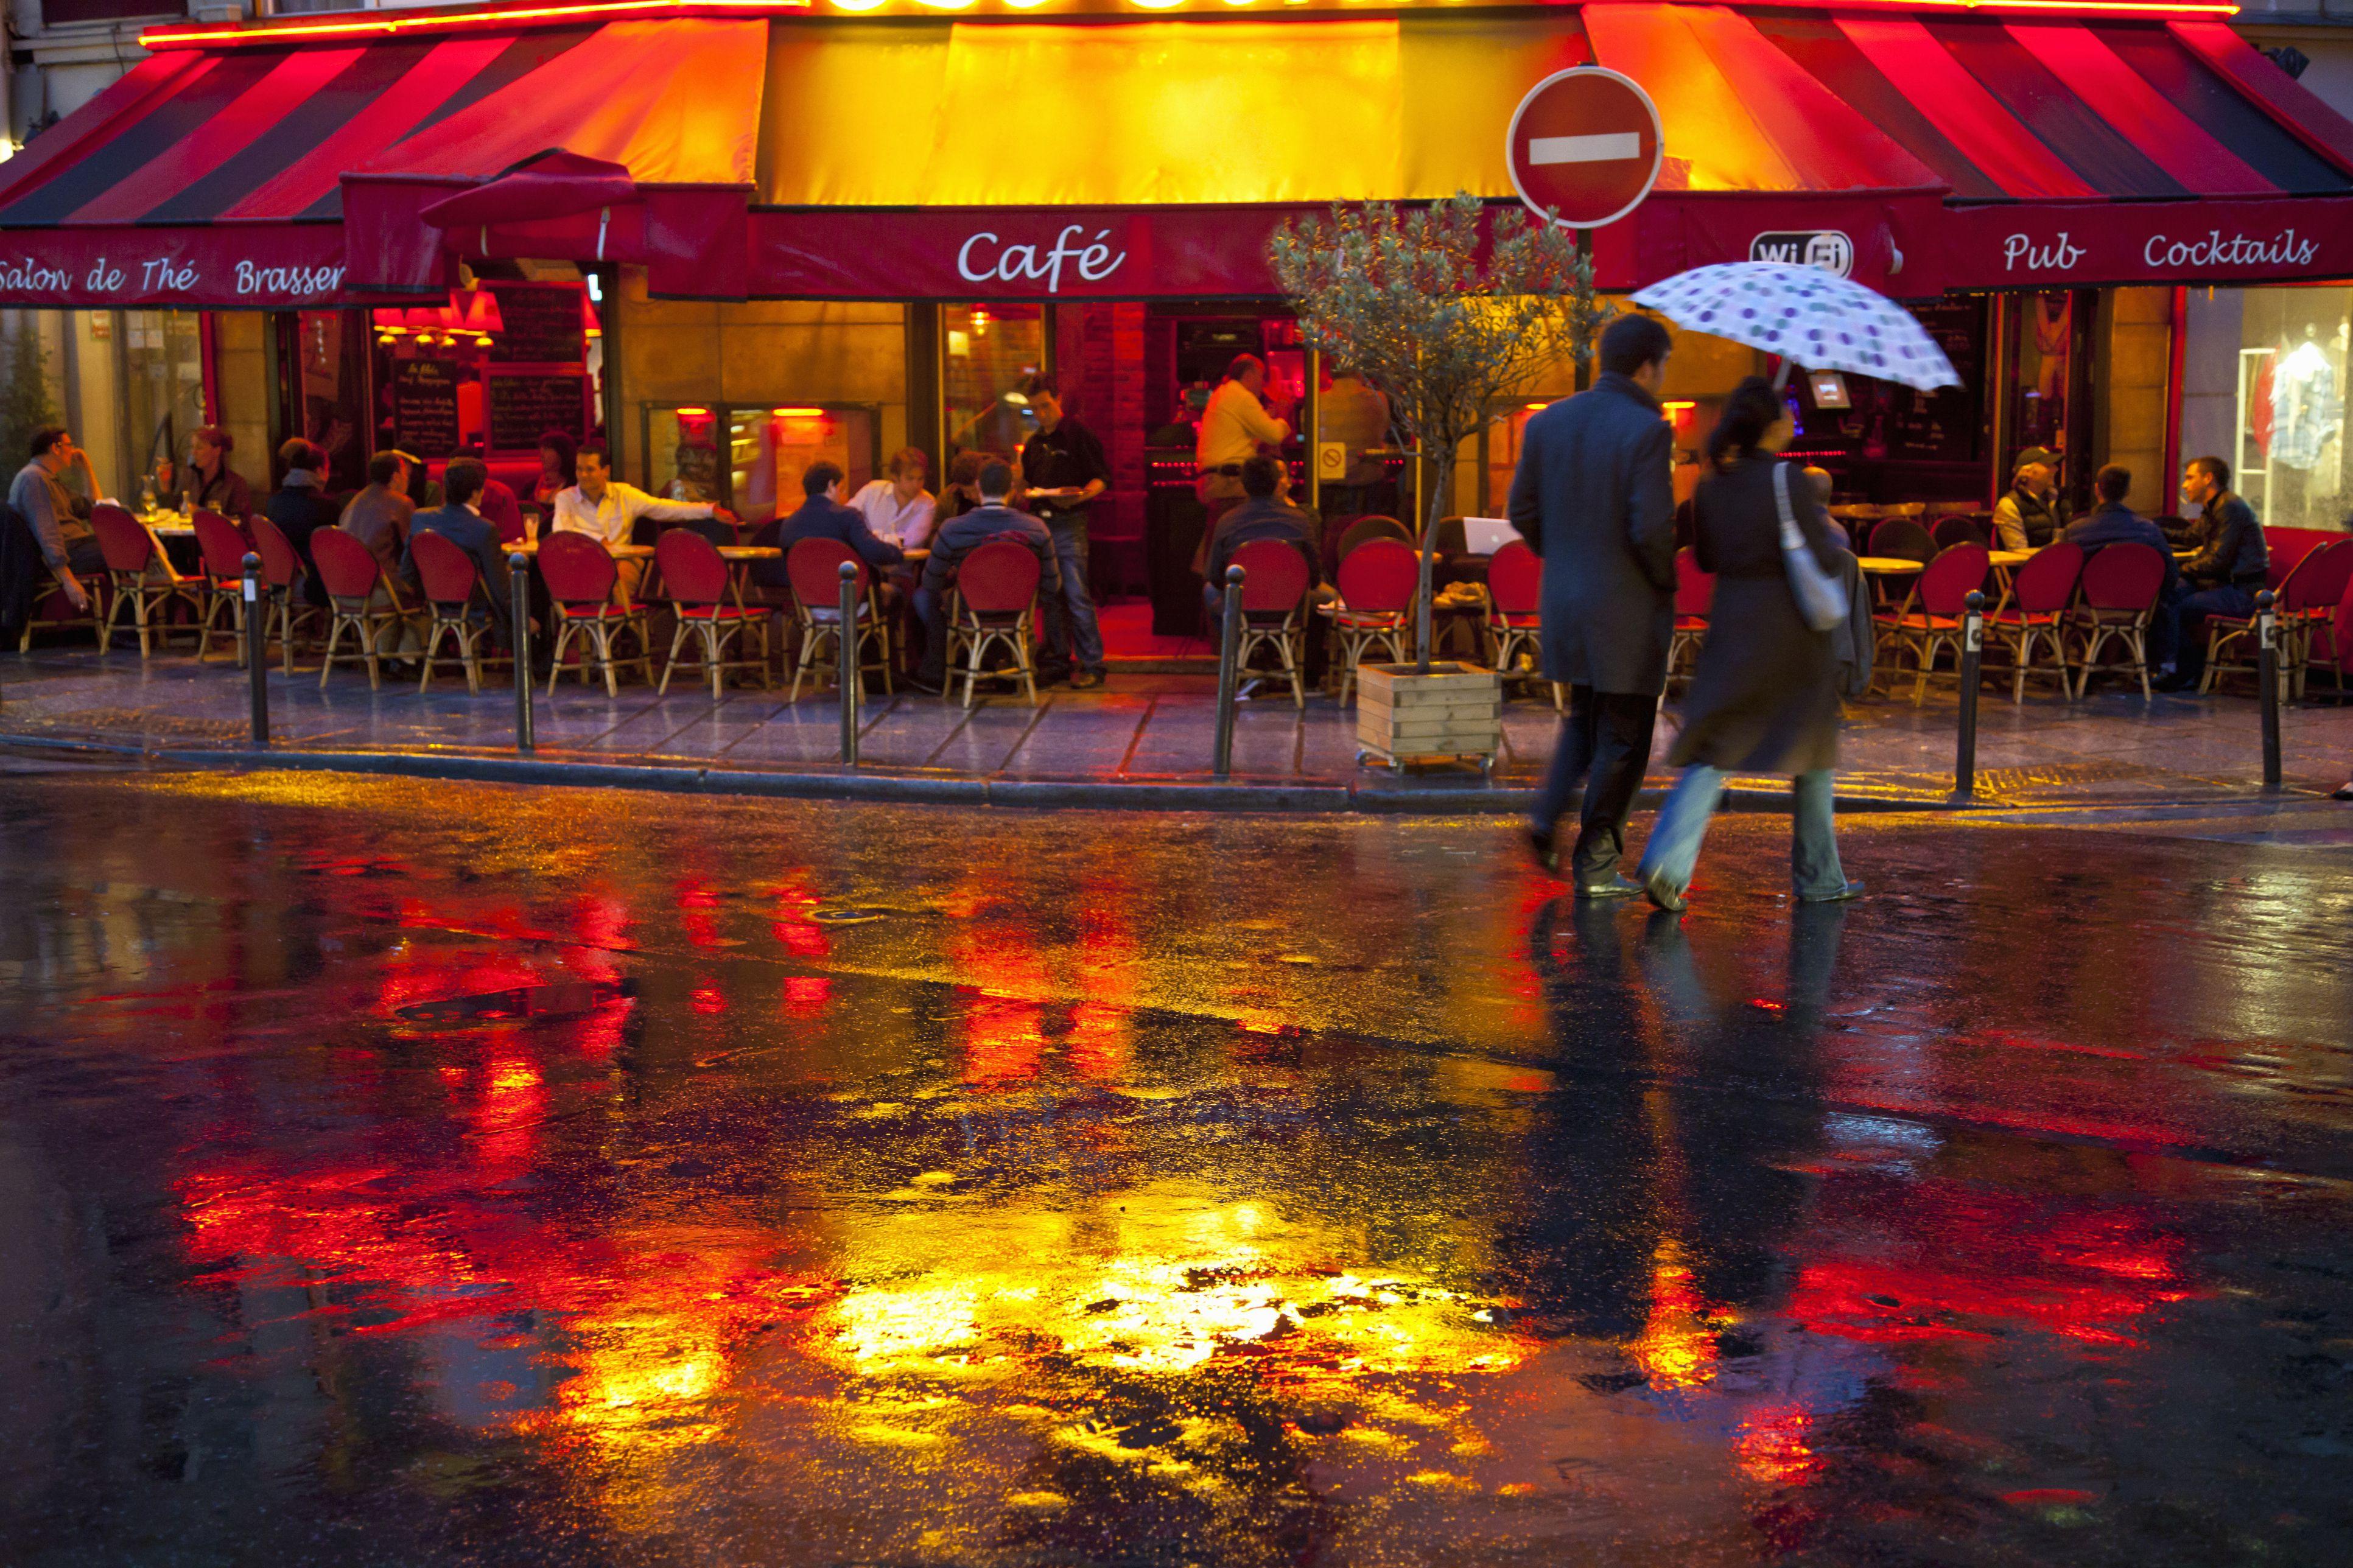 Cafe scene with couple in rain, Paris